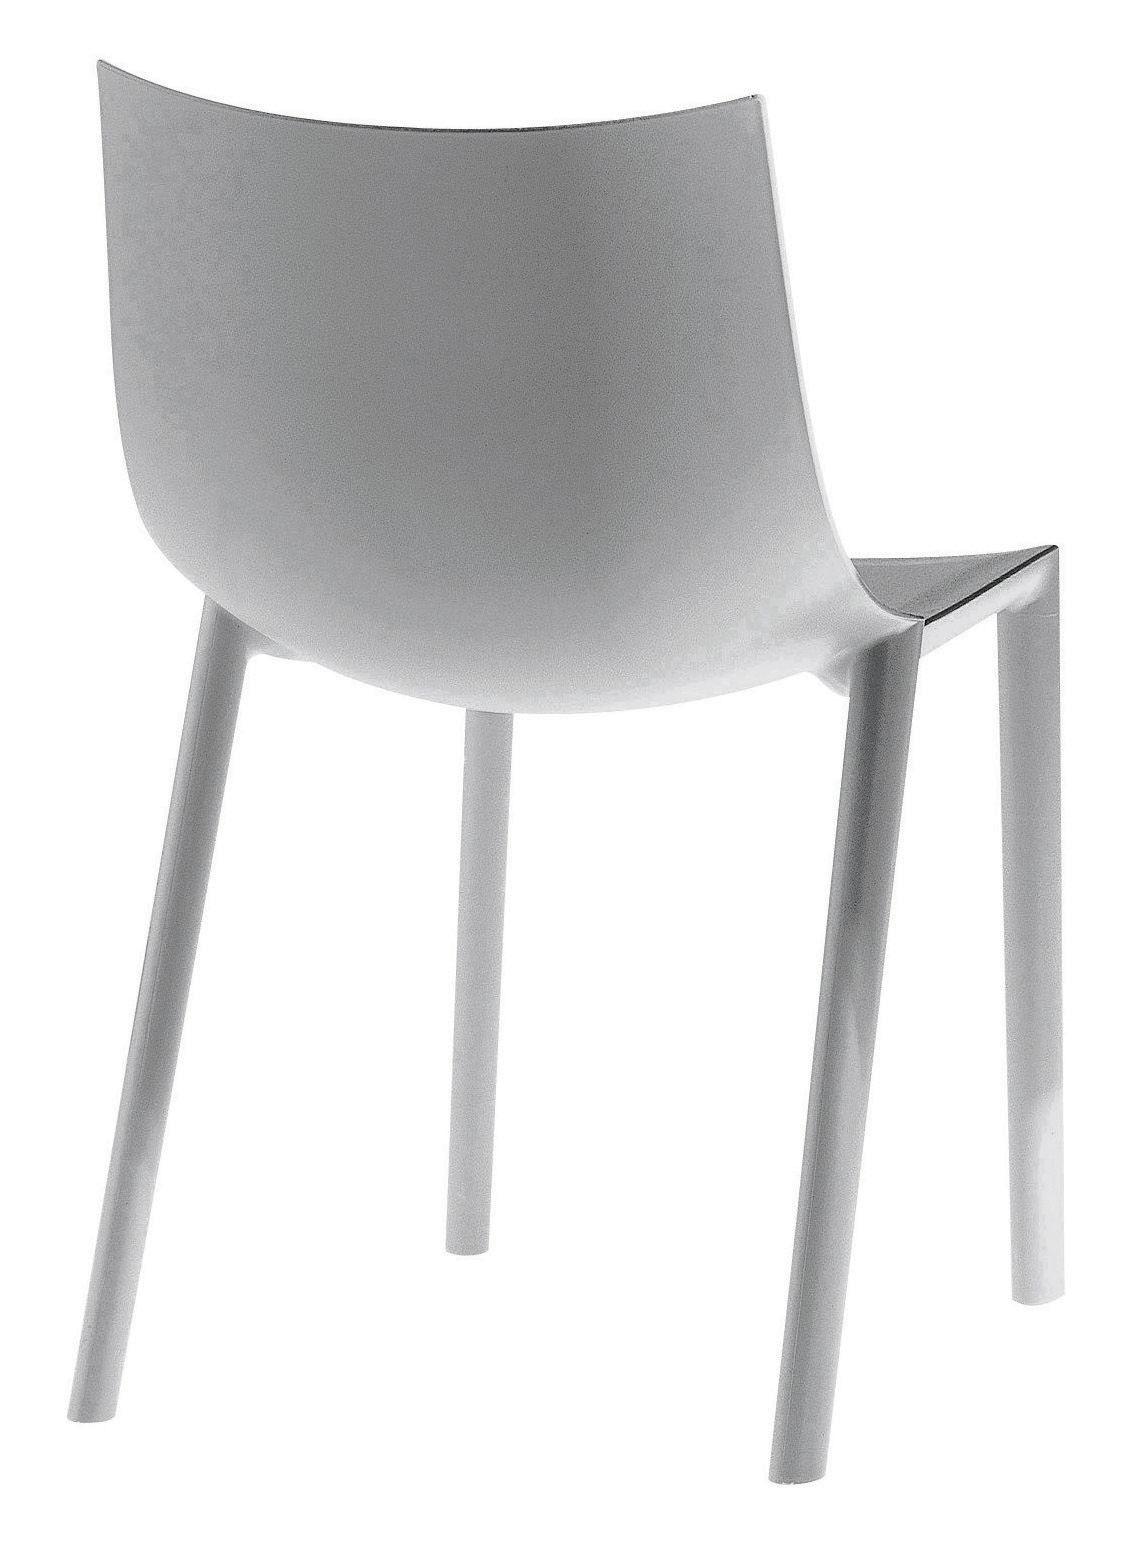 Möbel - Stühle  - Bo Stapelbarer Stuhl - Driade - Grau - Polypropylen